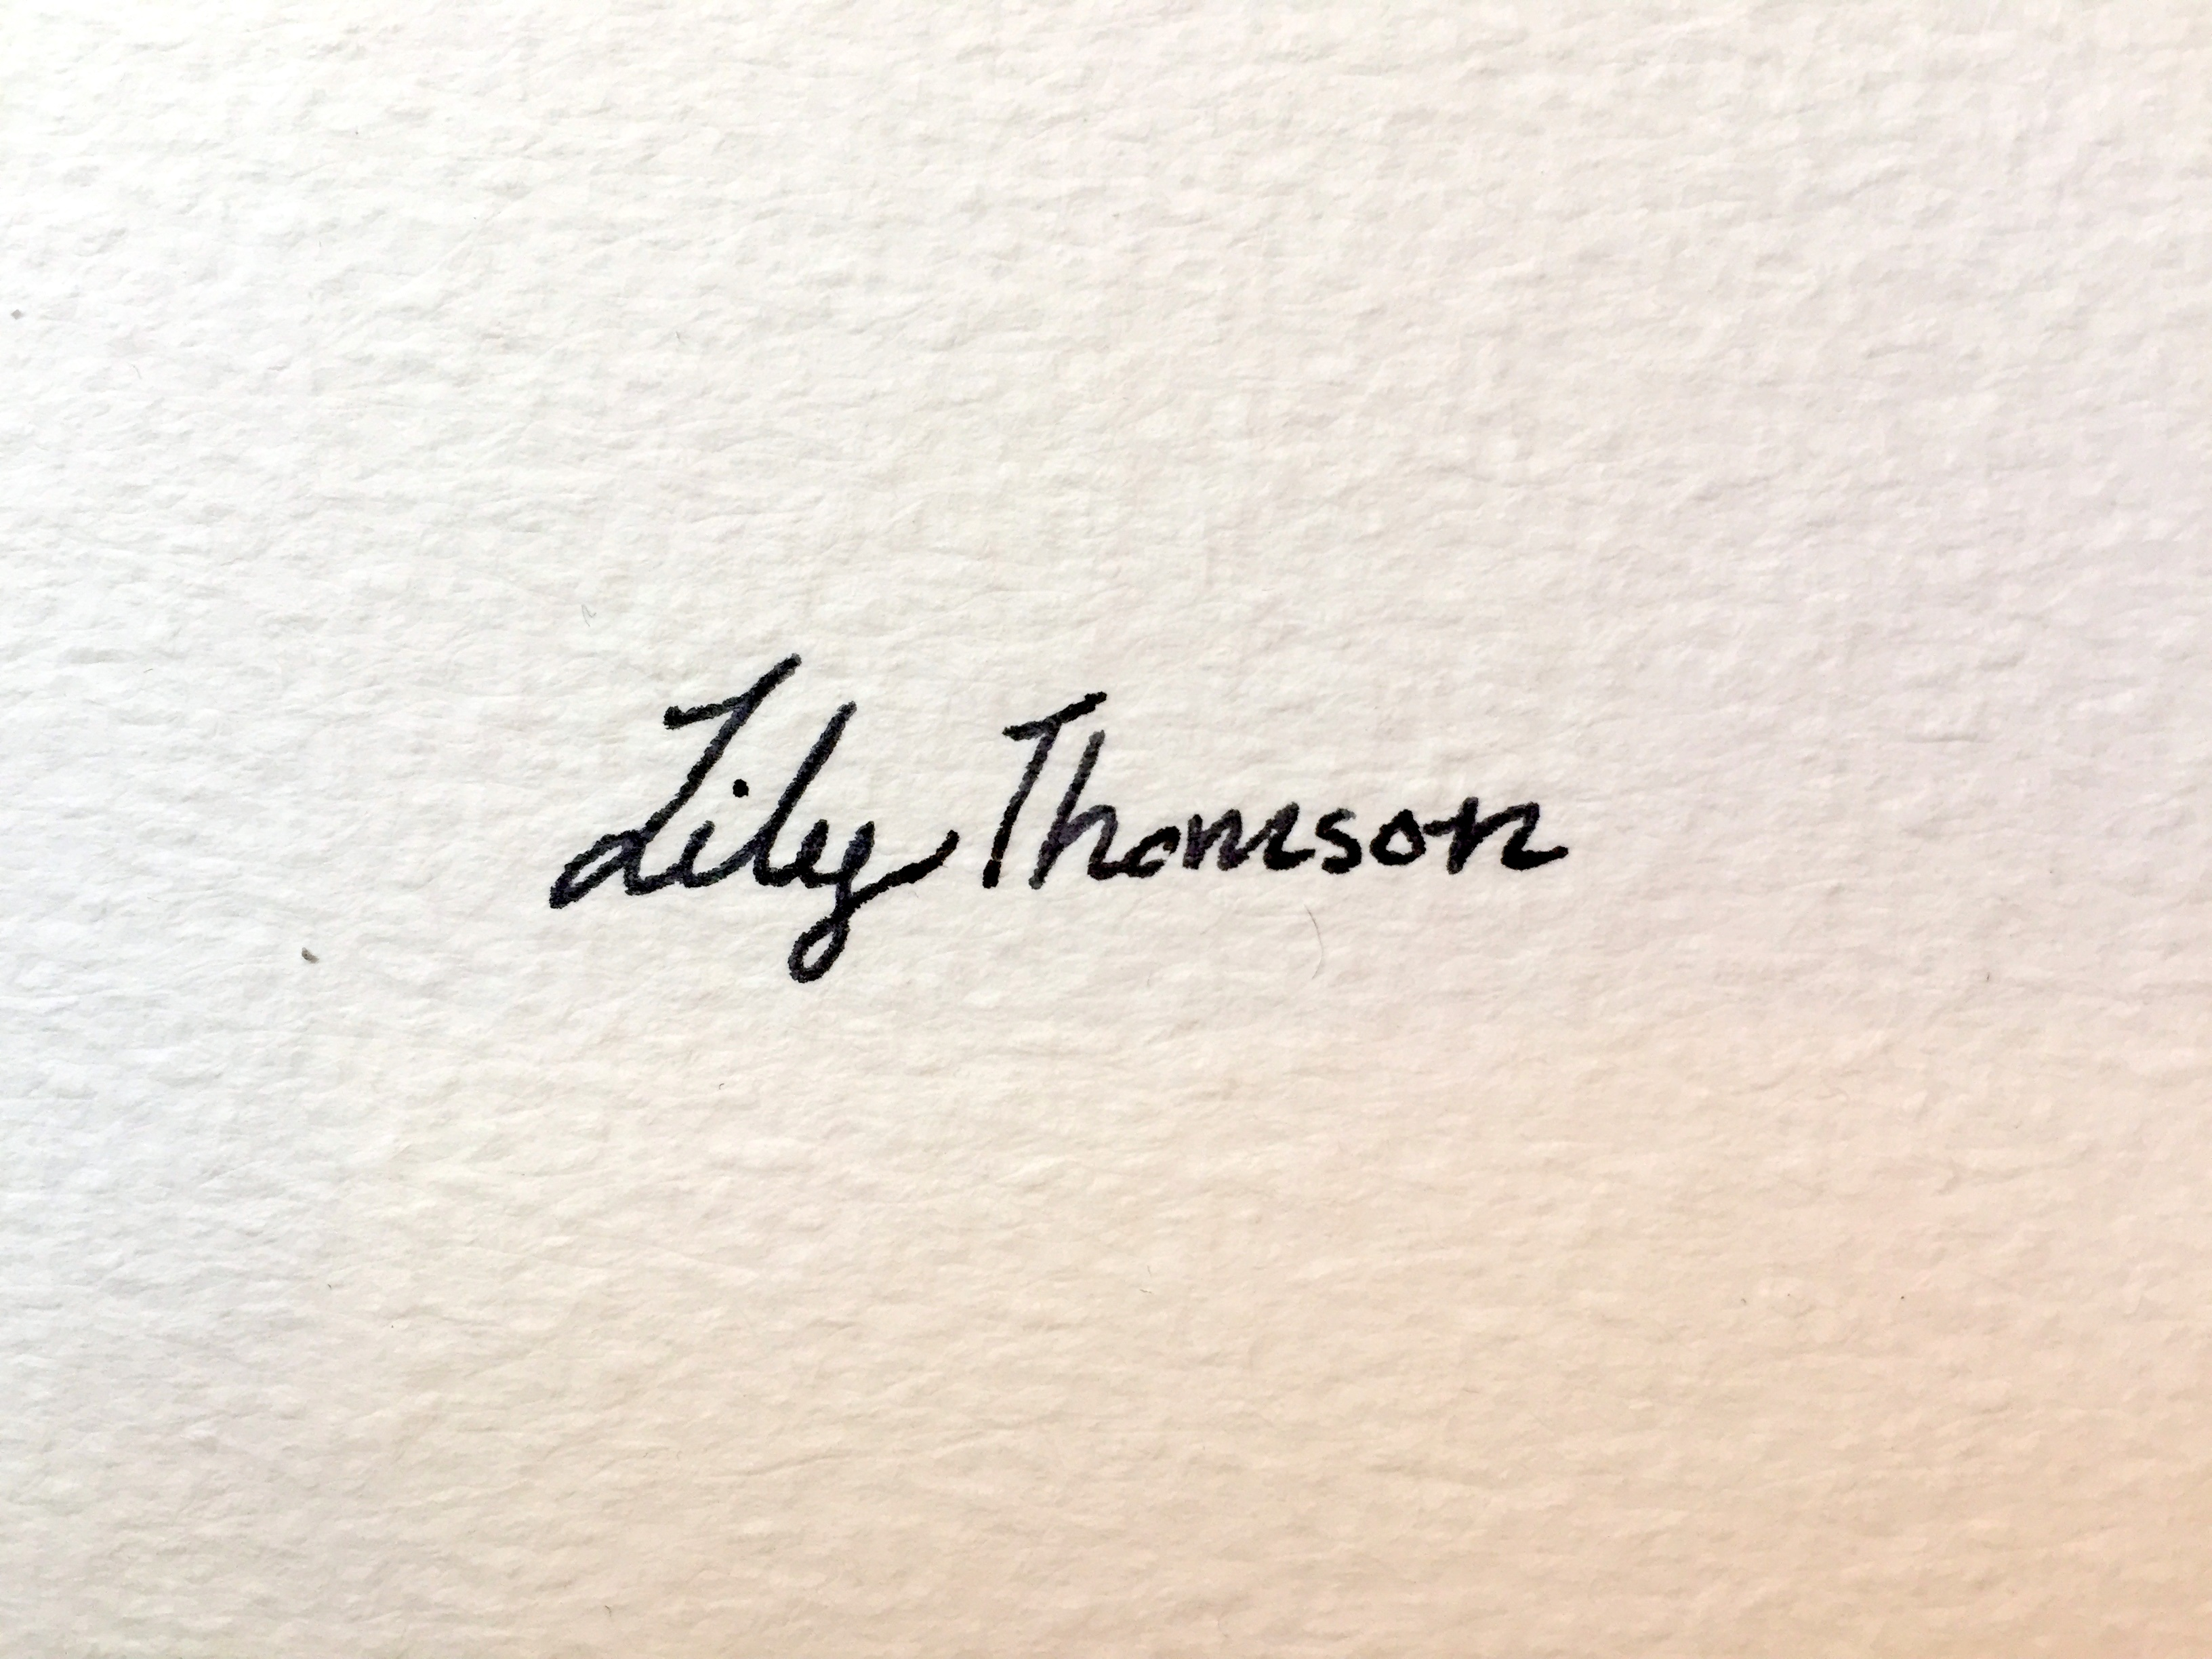 lily Thomson Designs's Signature